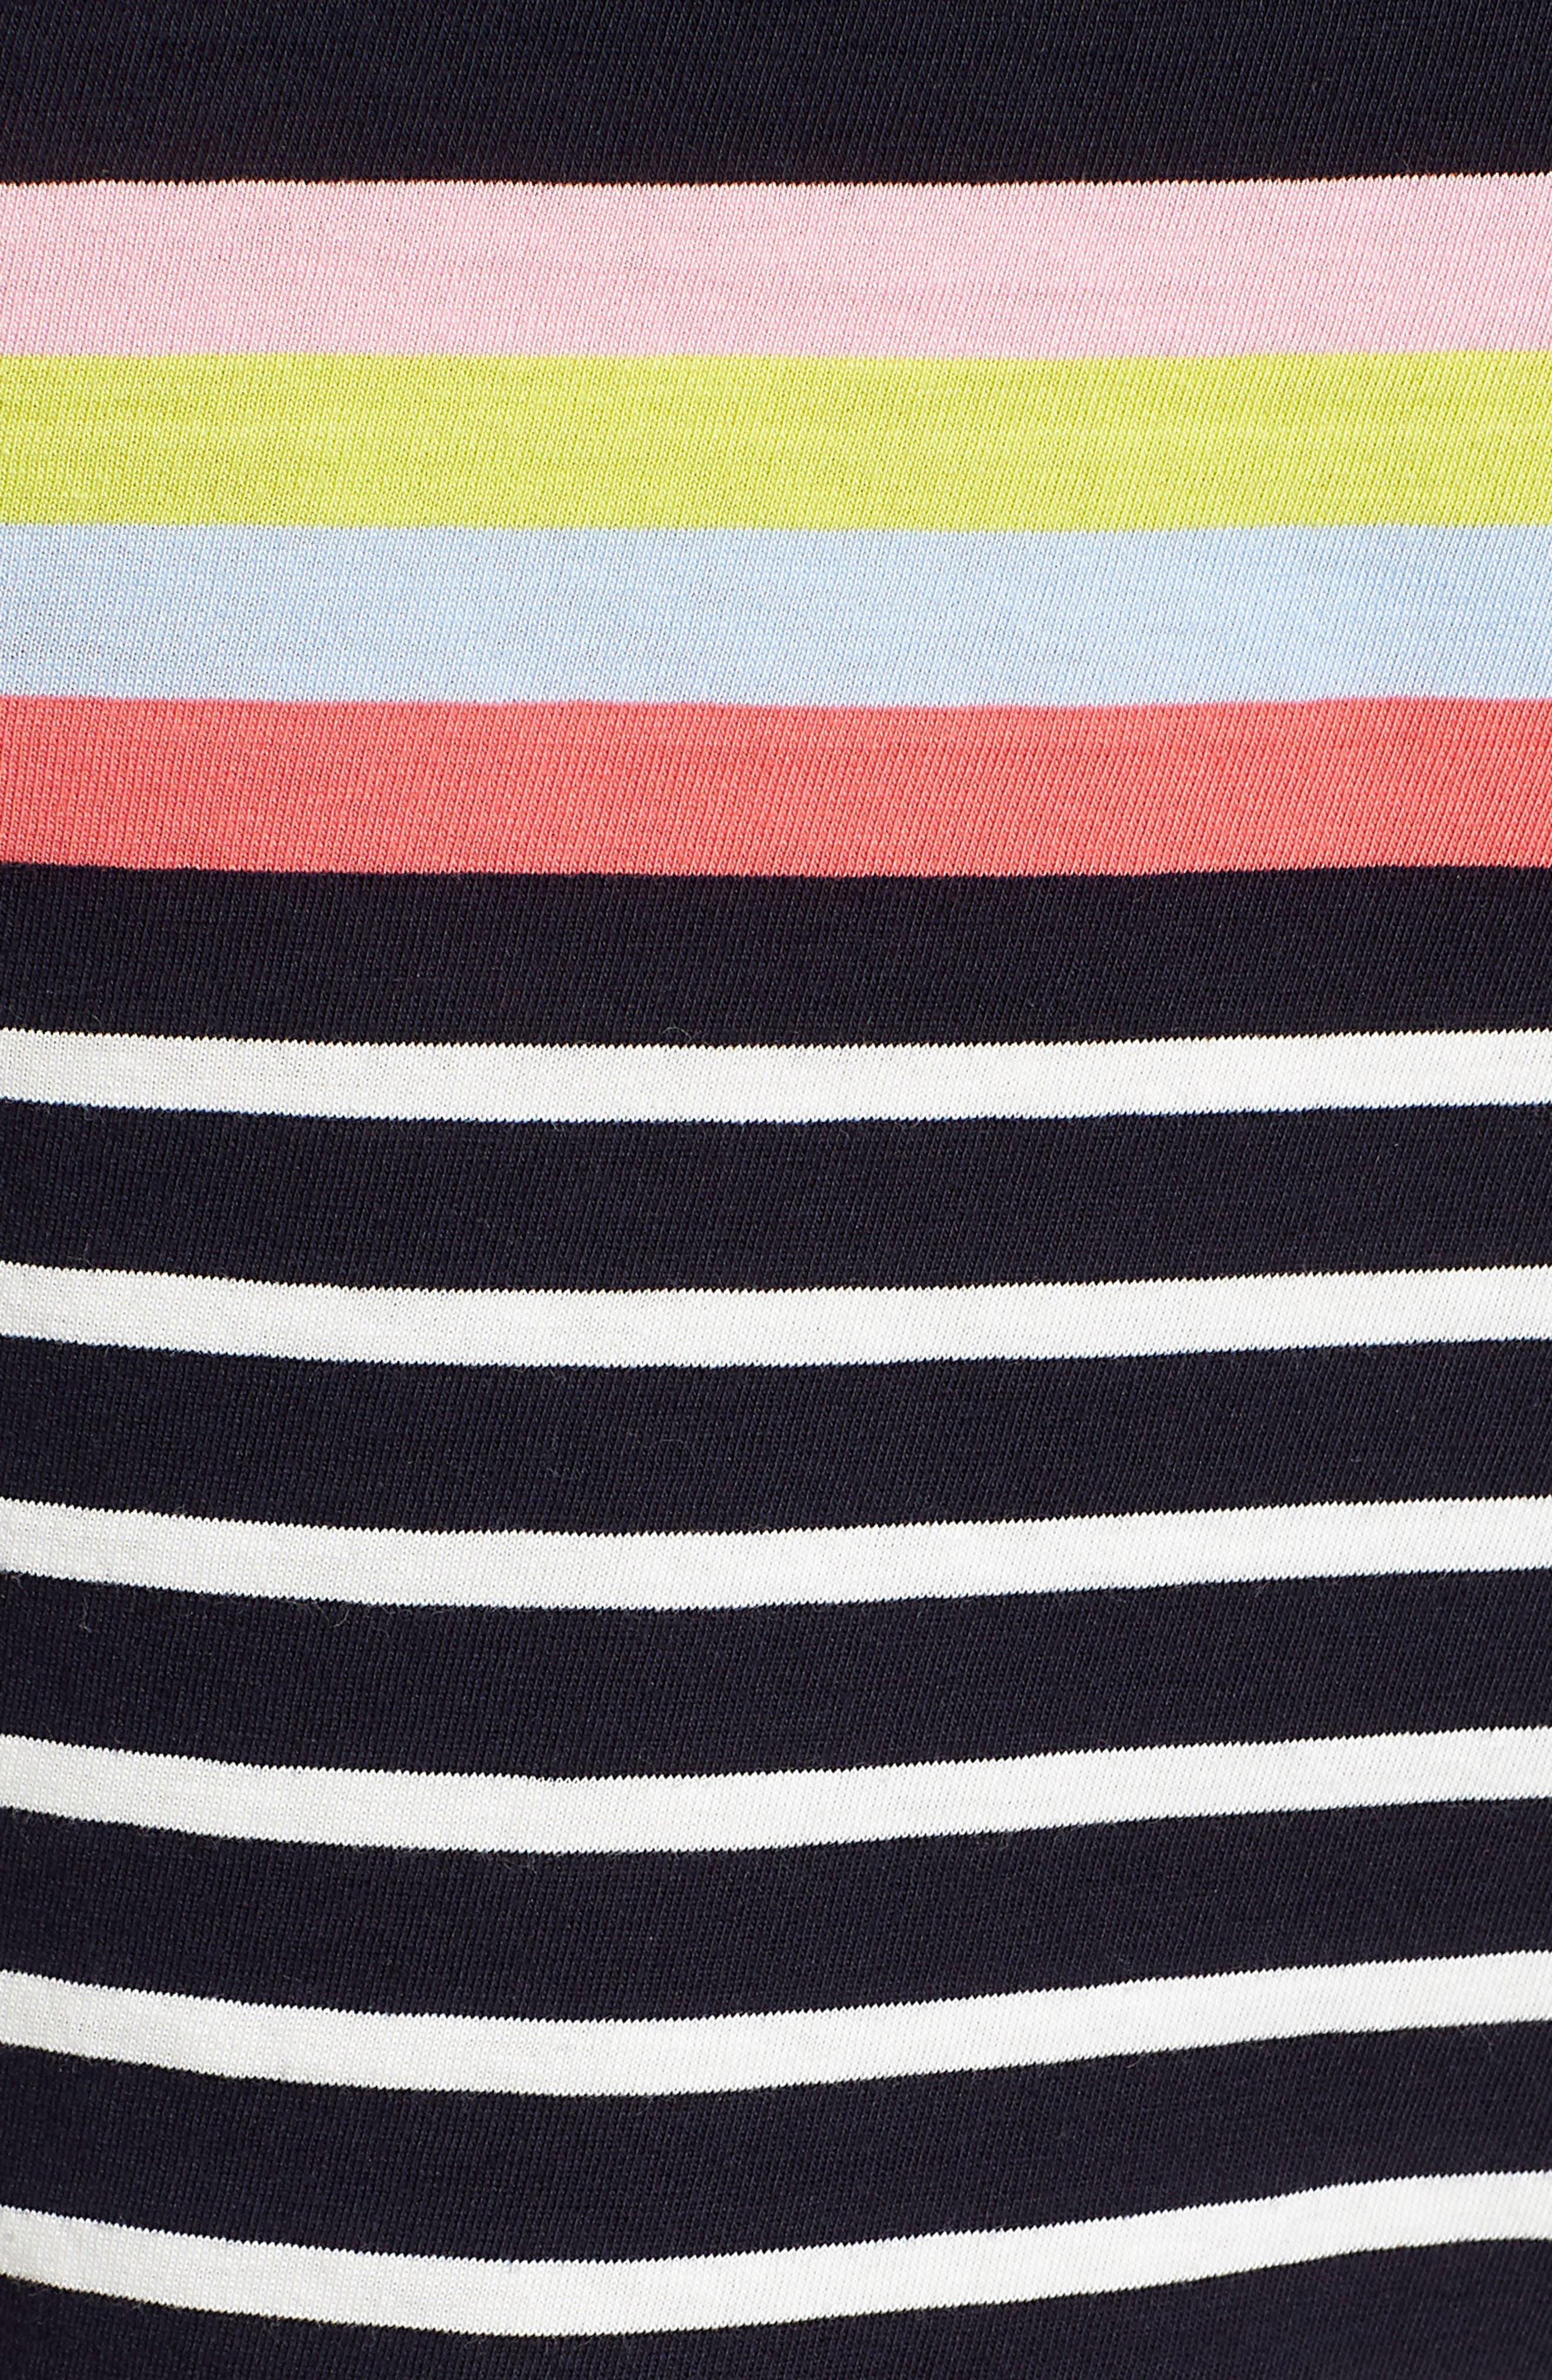 Breton Short Sleeve Stripe Cotton Top,                             Alternate thumbnail 22, color,